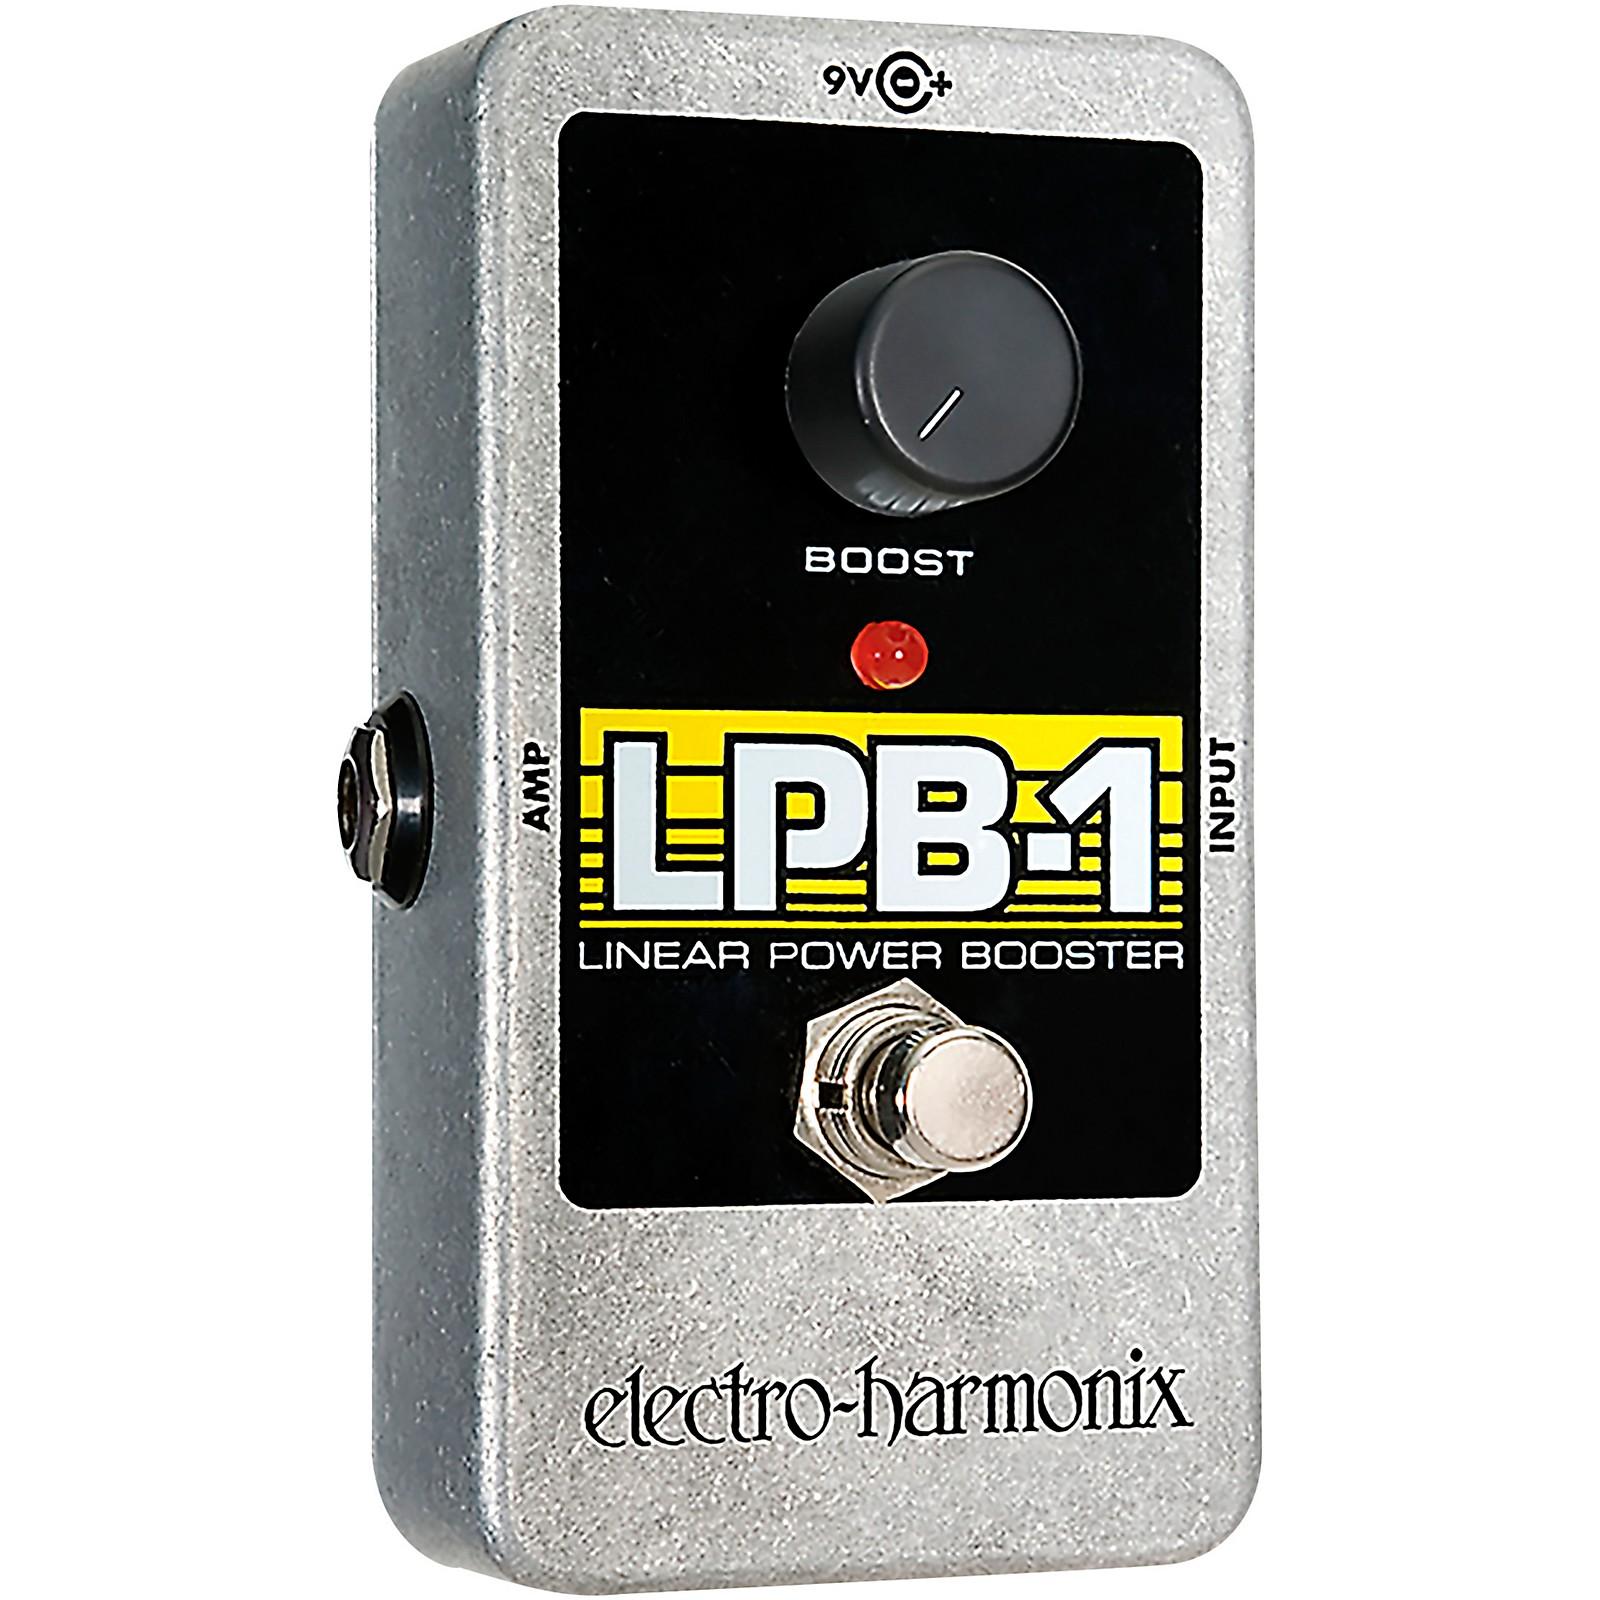 Electro-Harmonix Nano LPB-1 Linear Power Booster Guitar Effects Pedal